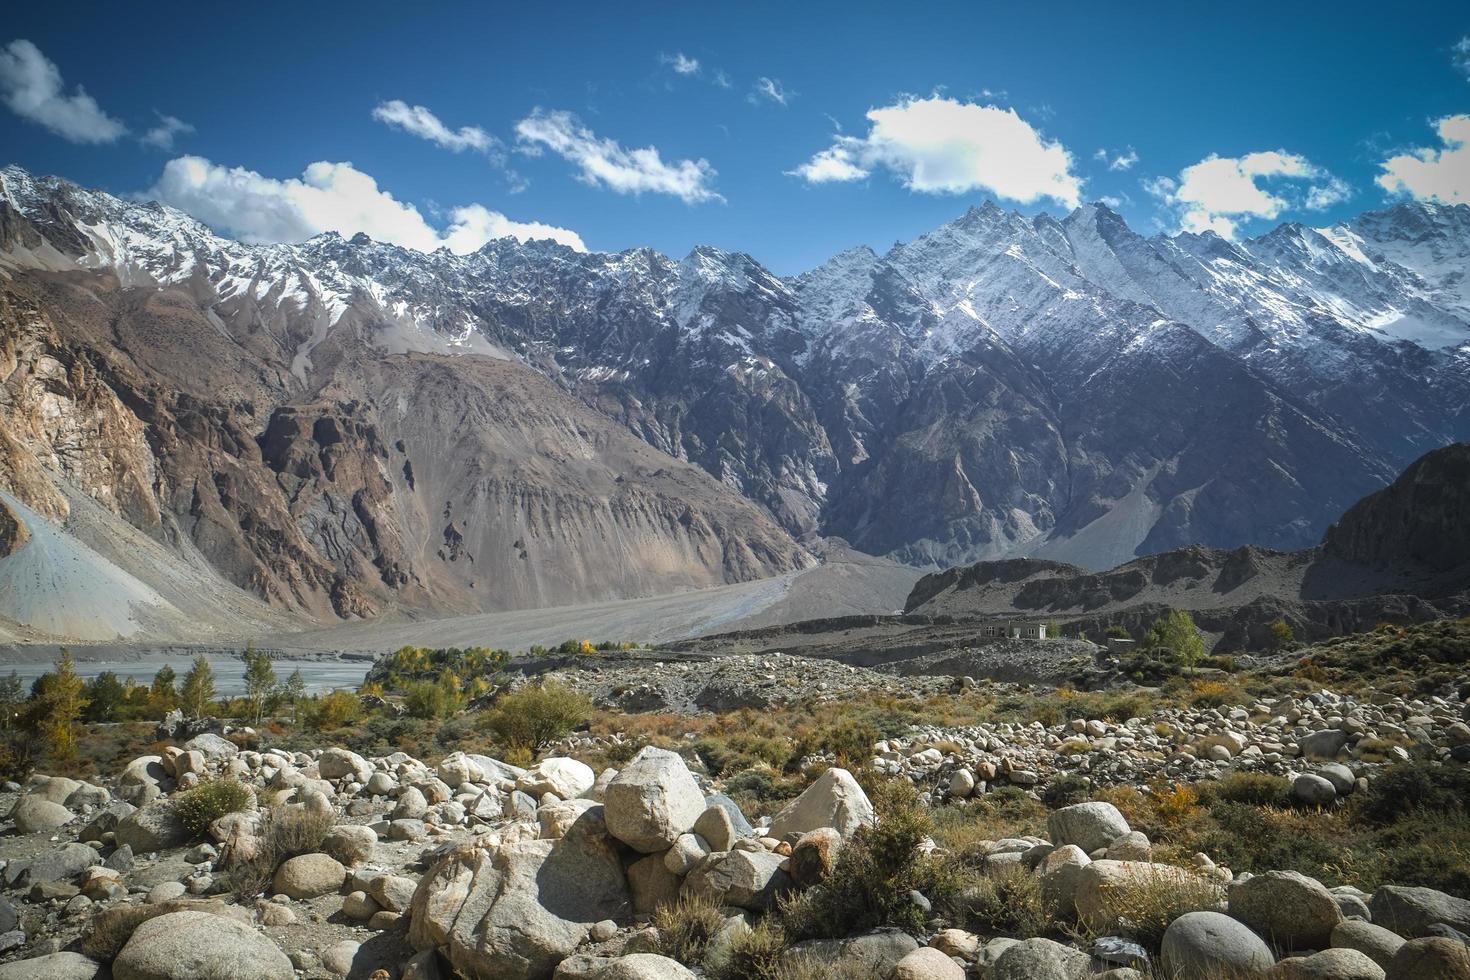 landskapsvy av Karakoram bergskedja i Pakistan foto